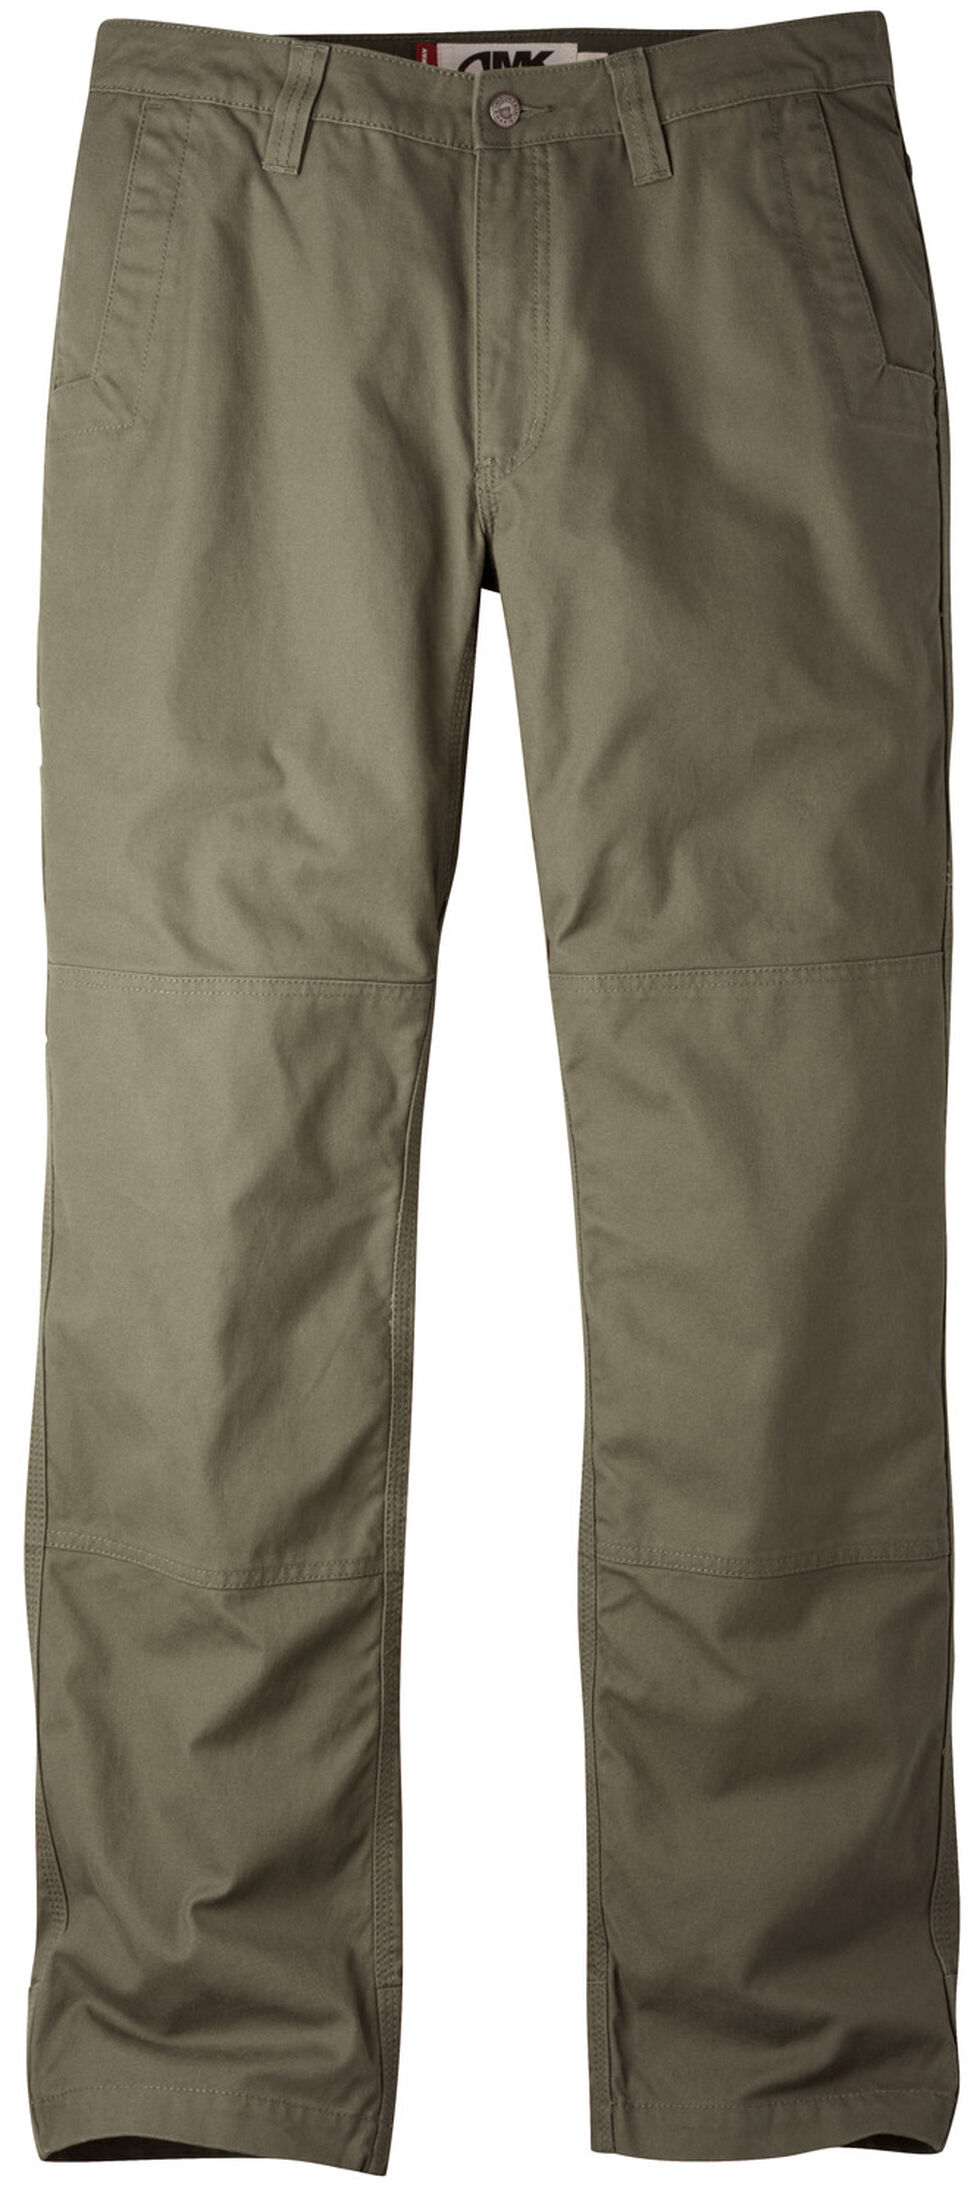 Mountain Khakis Men's Pine Green Alpine Utility Pants - Slim Fit , Green, hi-res